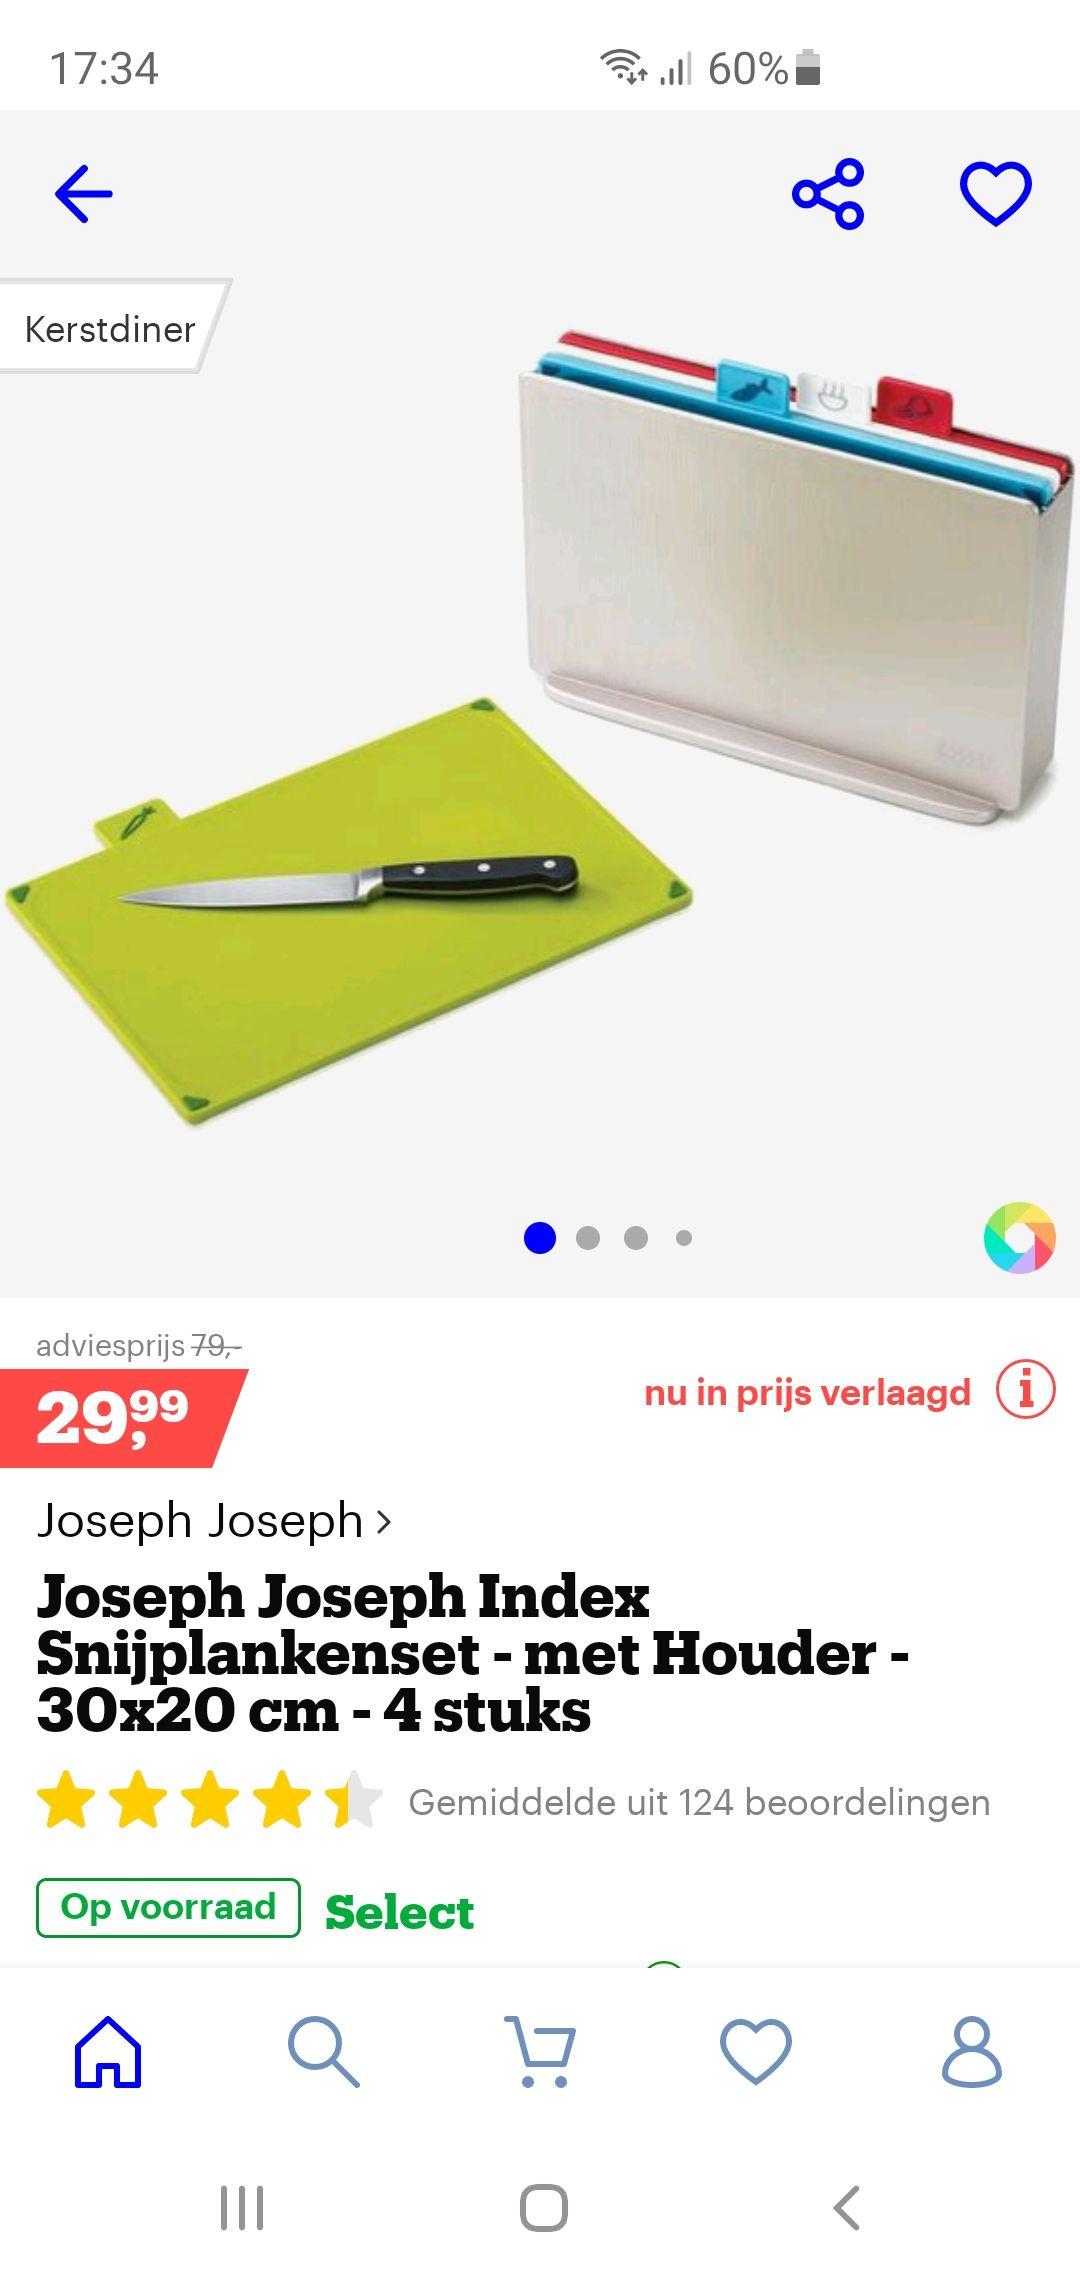 Joseph Joseph snijplankenset met houder